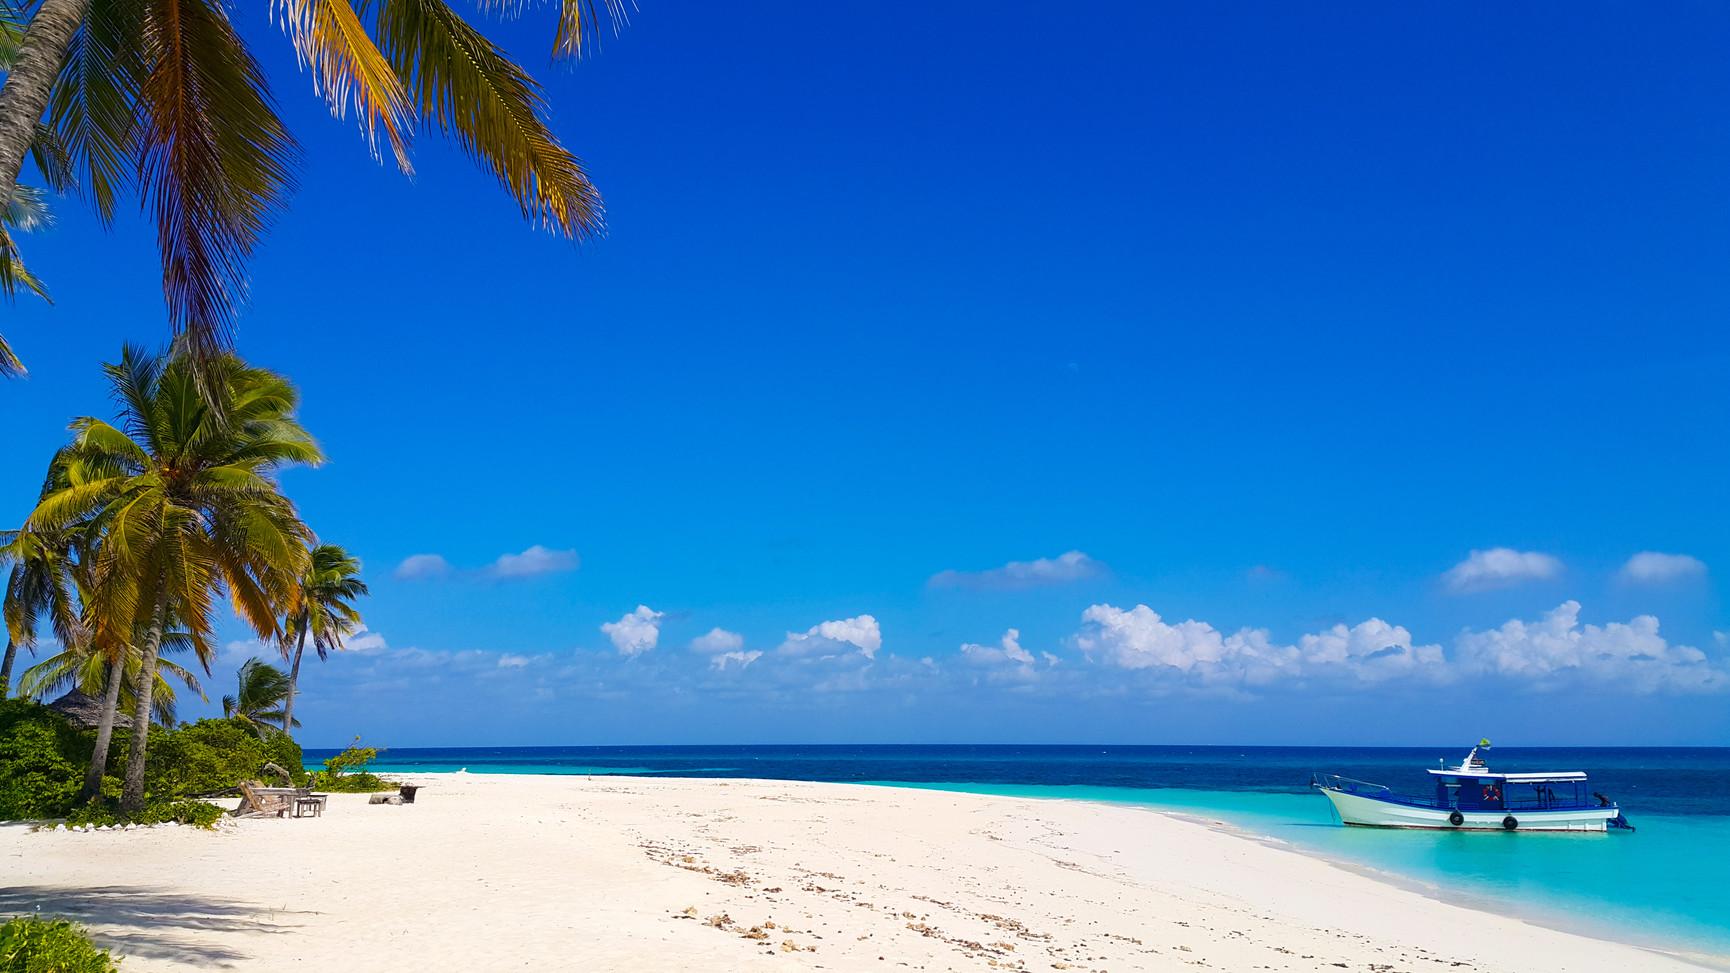 Tanzania Fanjove Island beach and boat